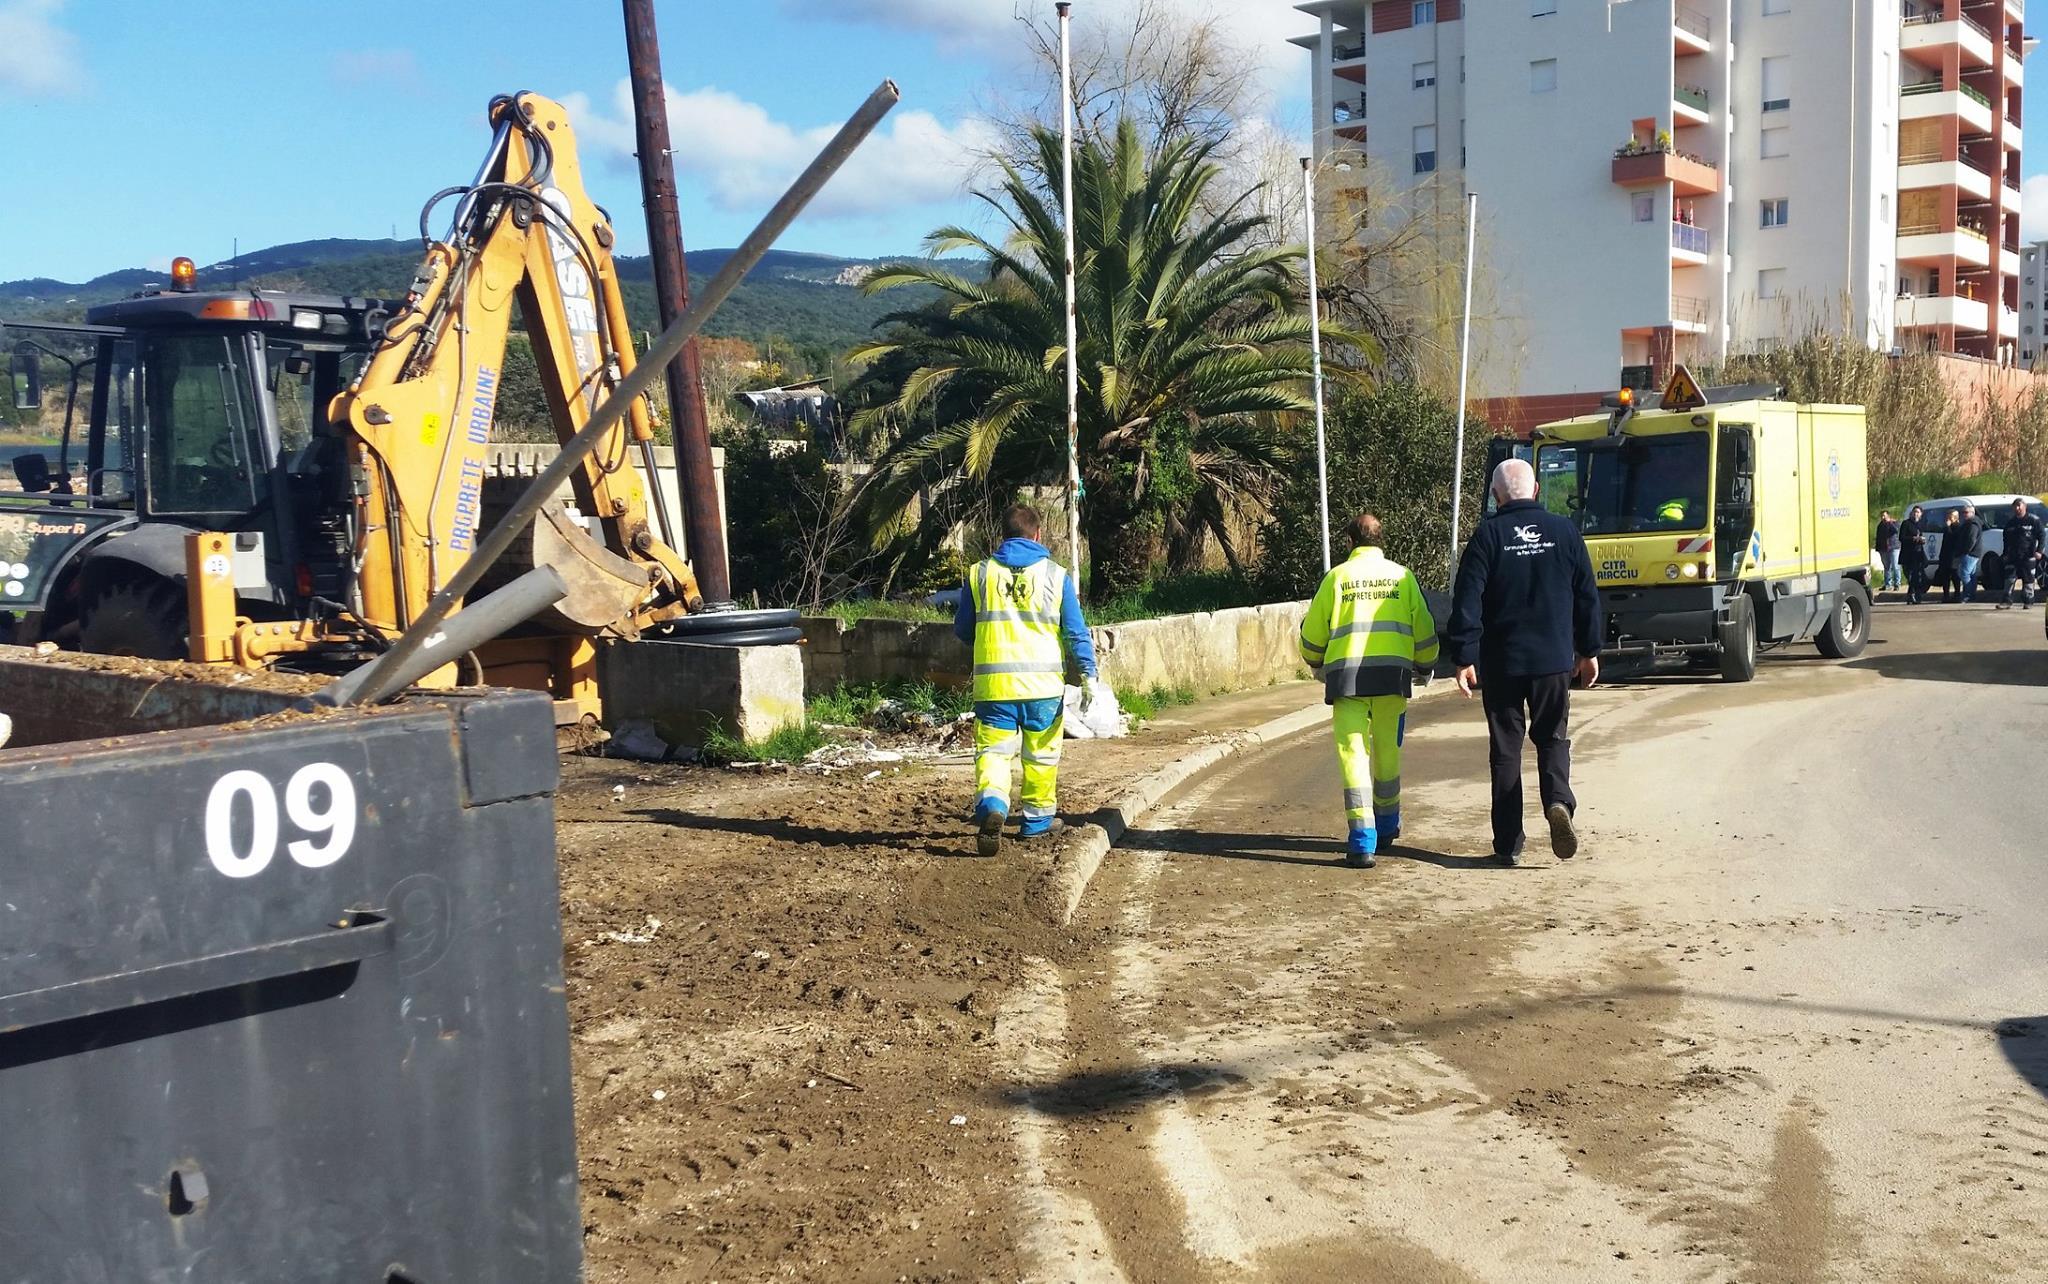 1er mars Opération propreté Terre-plein d'Alzo di Leva